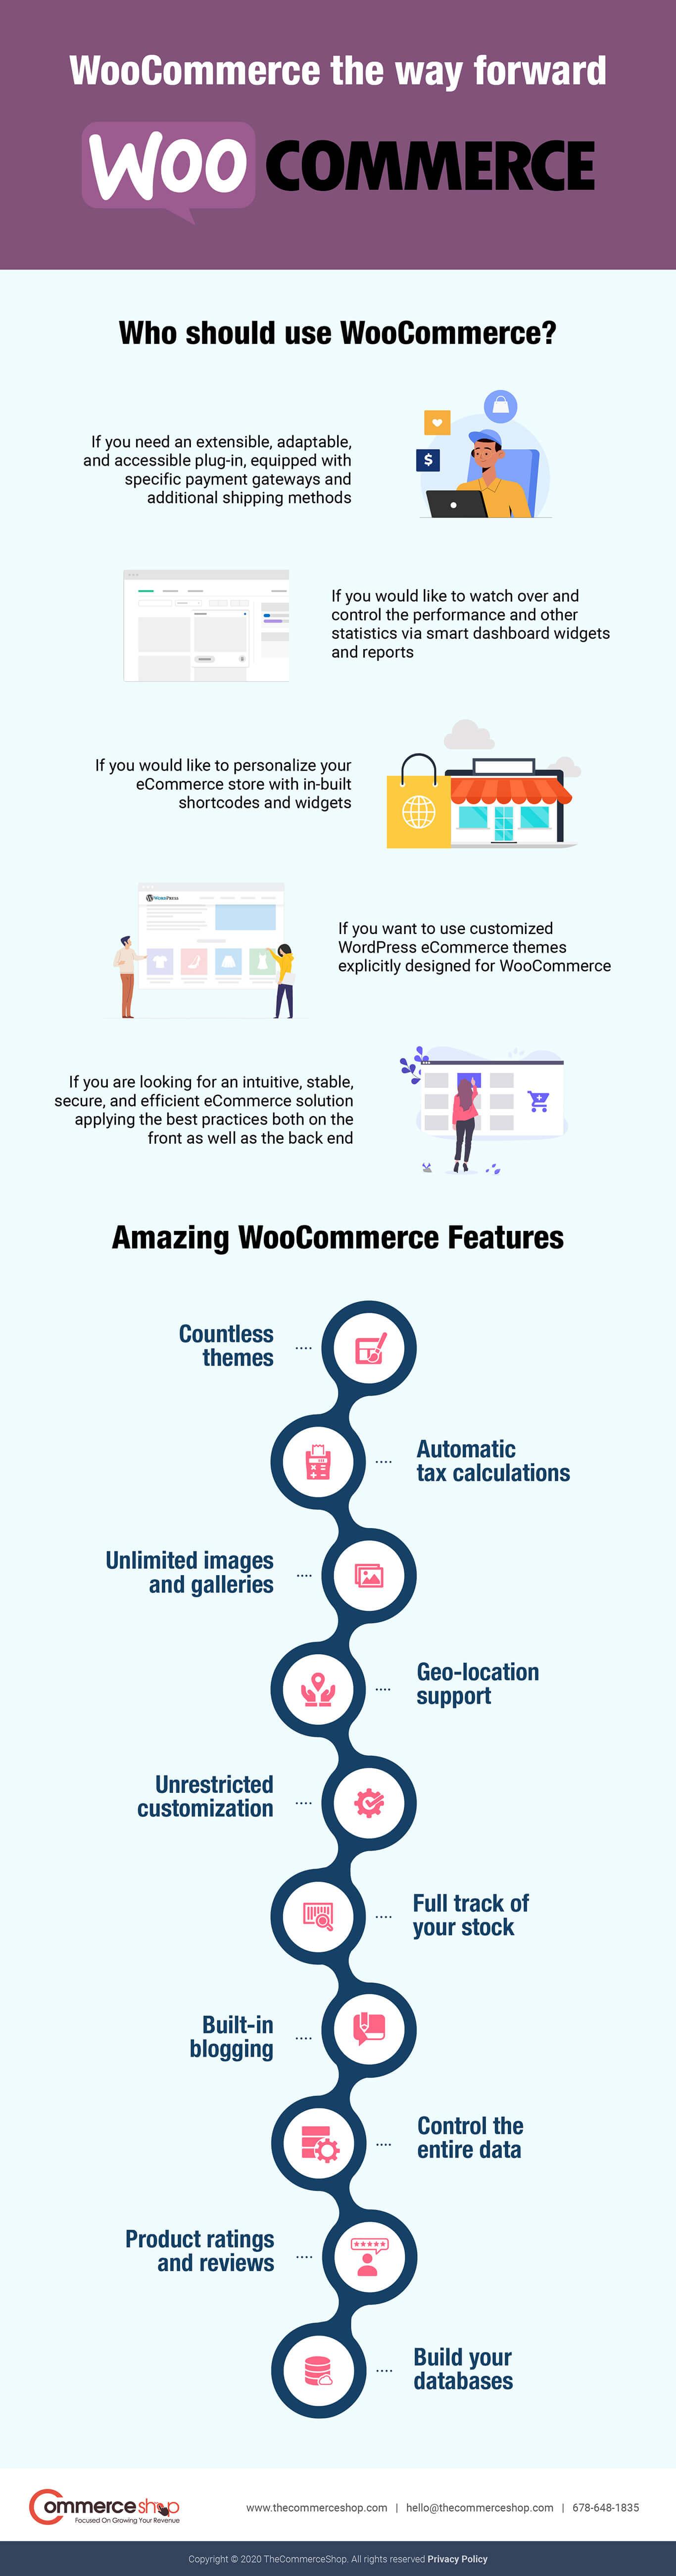 woocommerce-the-way-forward